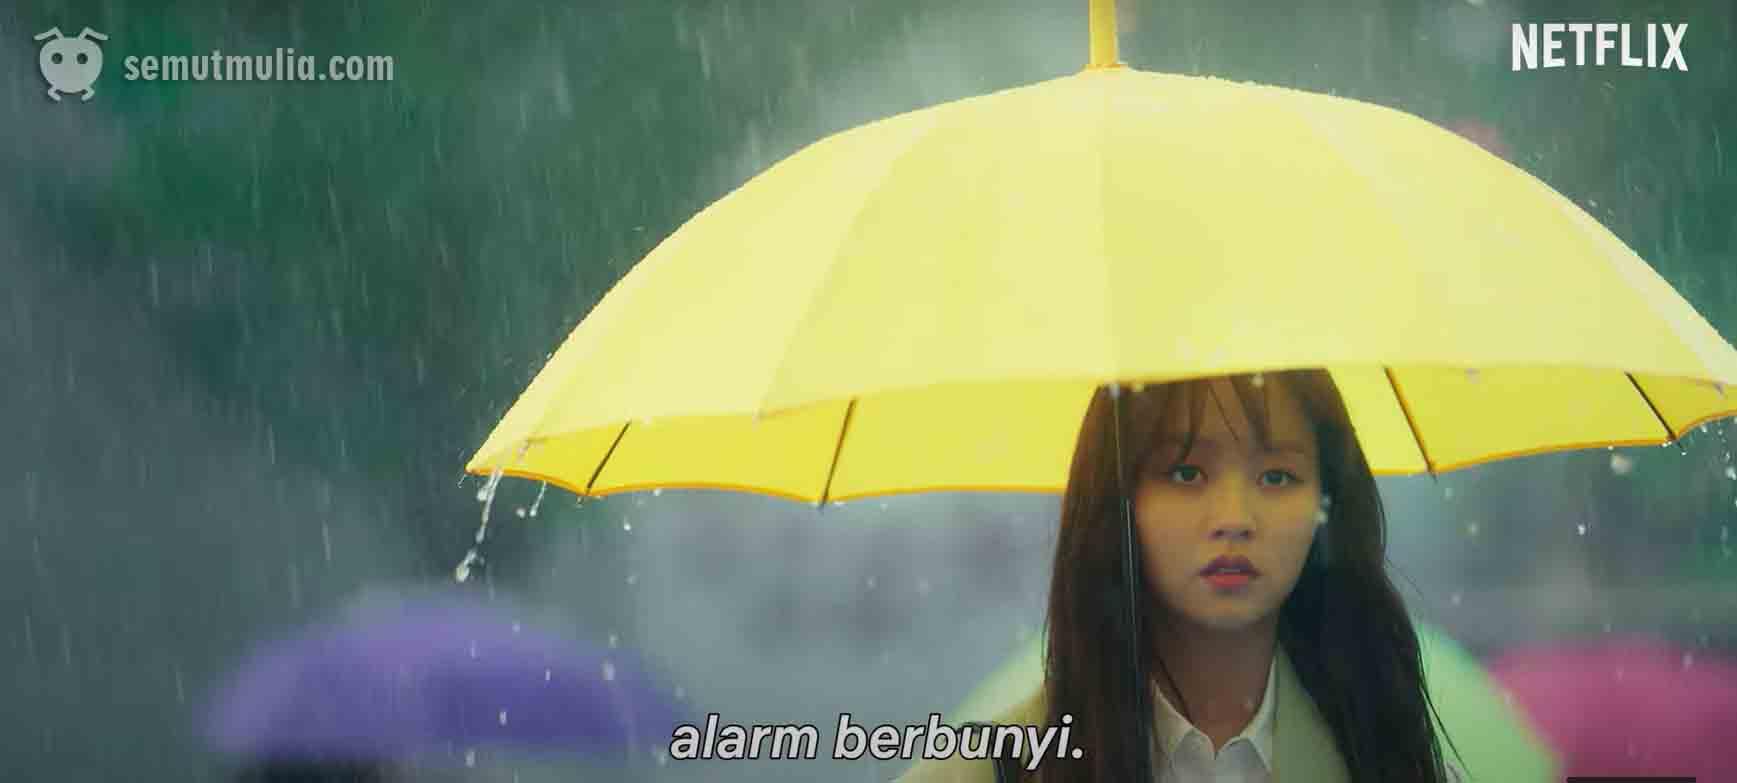 Sinopsis Love Alarm (Youtube Netflix Indonesia) 1